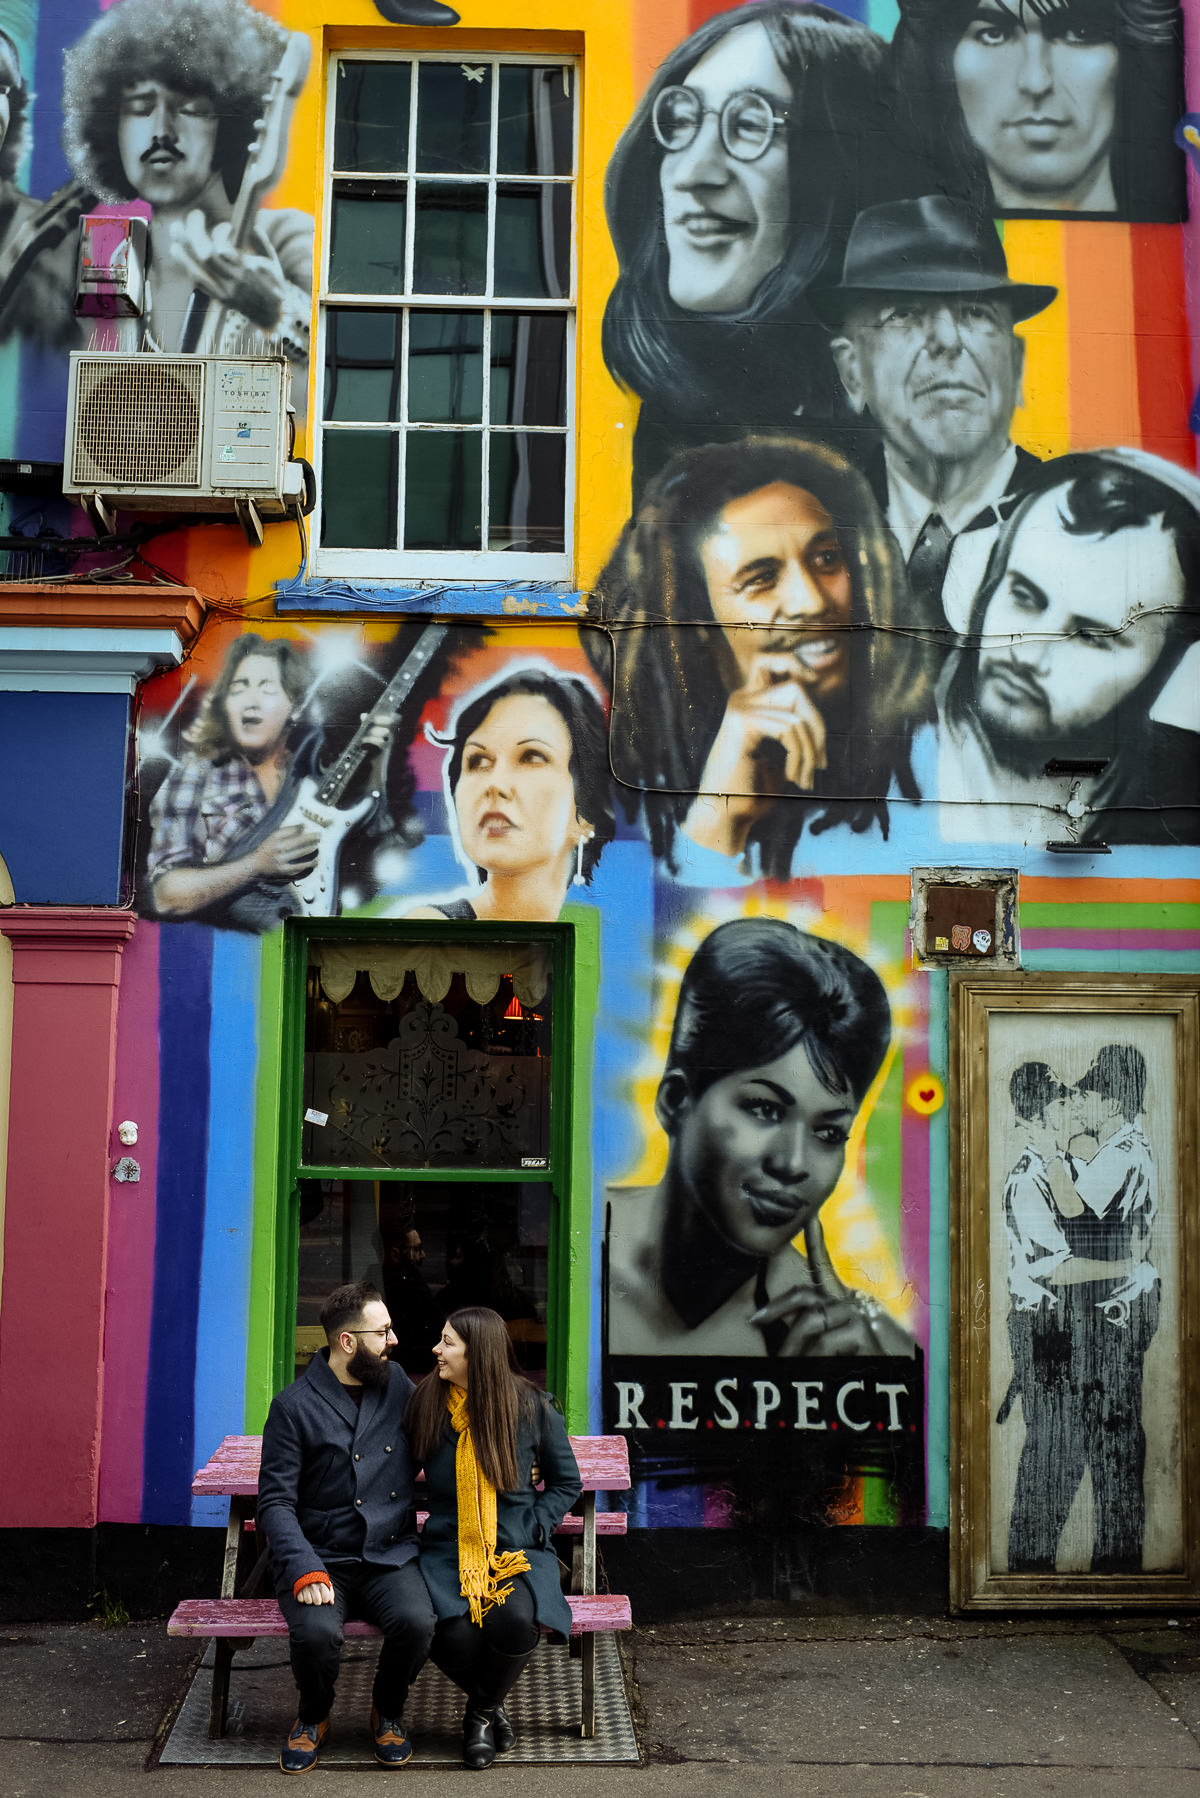 Brighton engagement shoot with Graffiti Prince Albert Pub